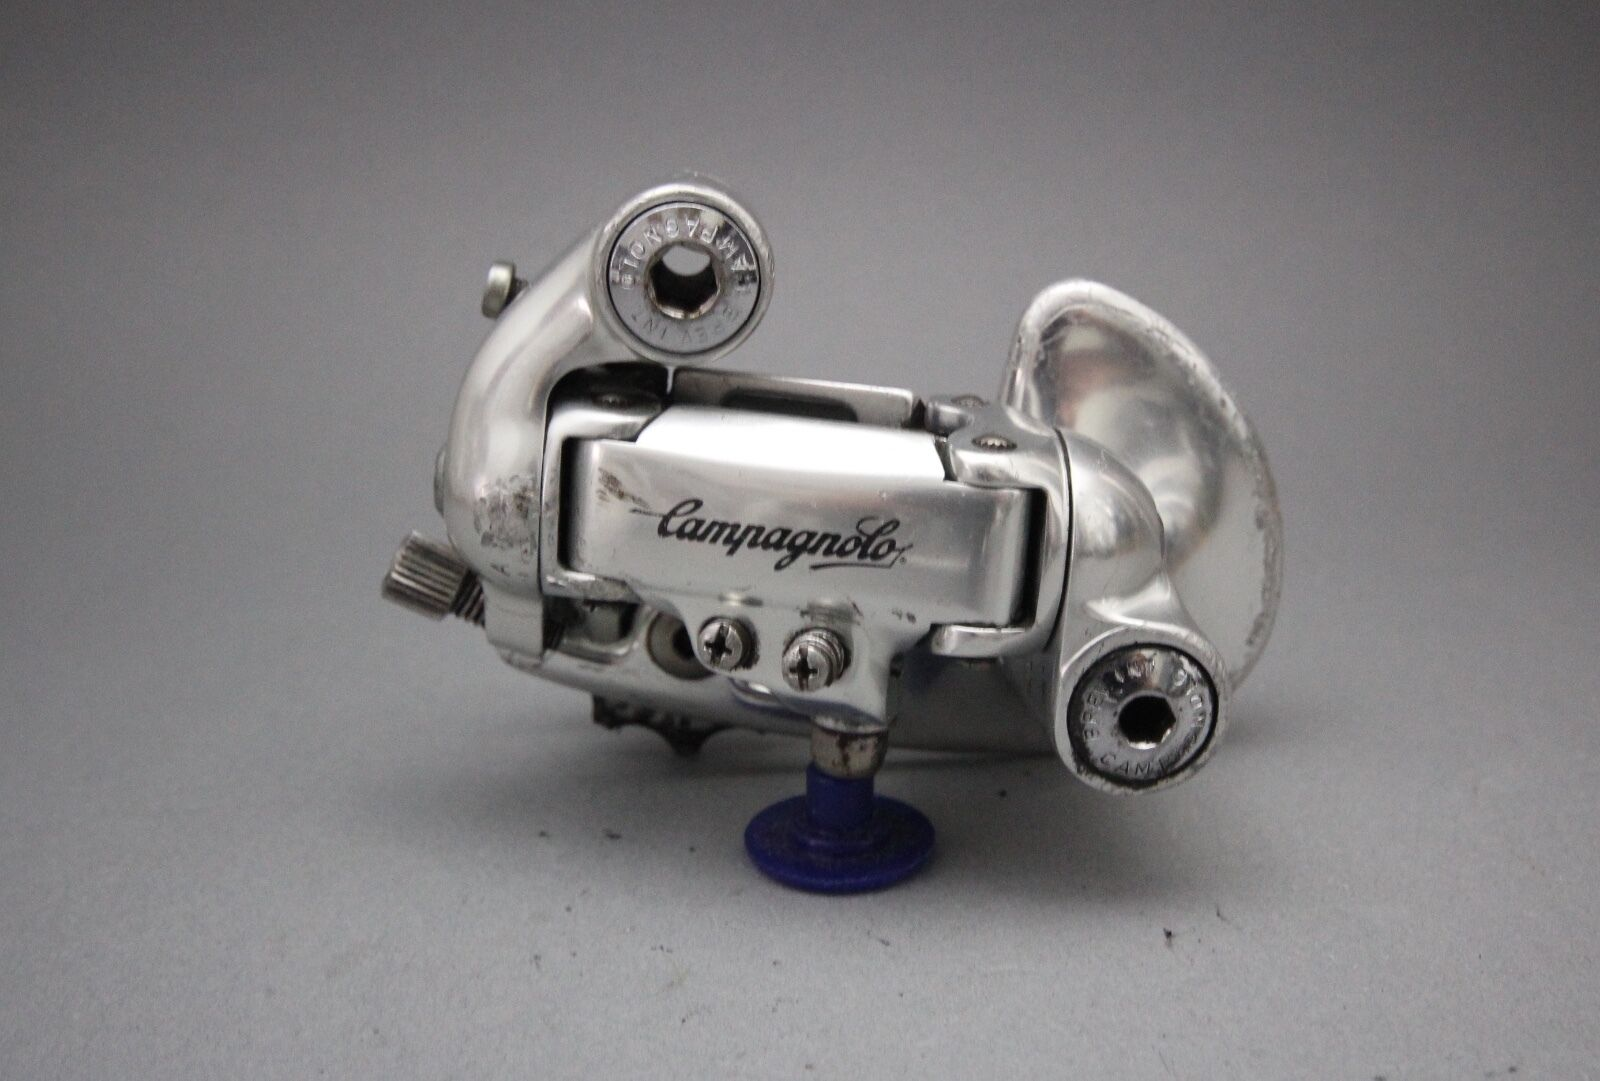 Campagnolo Chorus C010-SM 8-speed rear derailleur 239 gram Synchro Friction